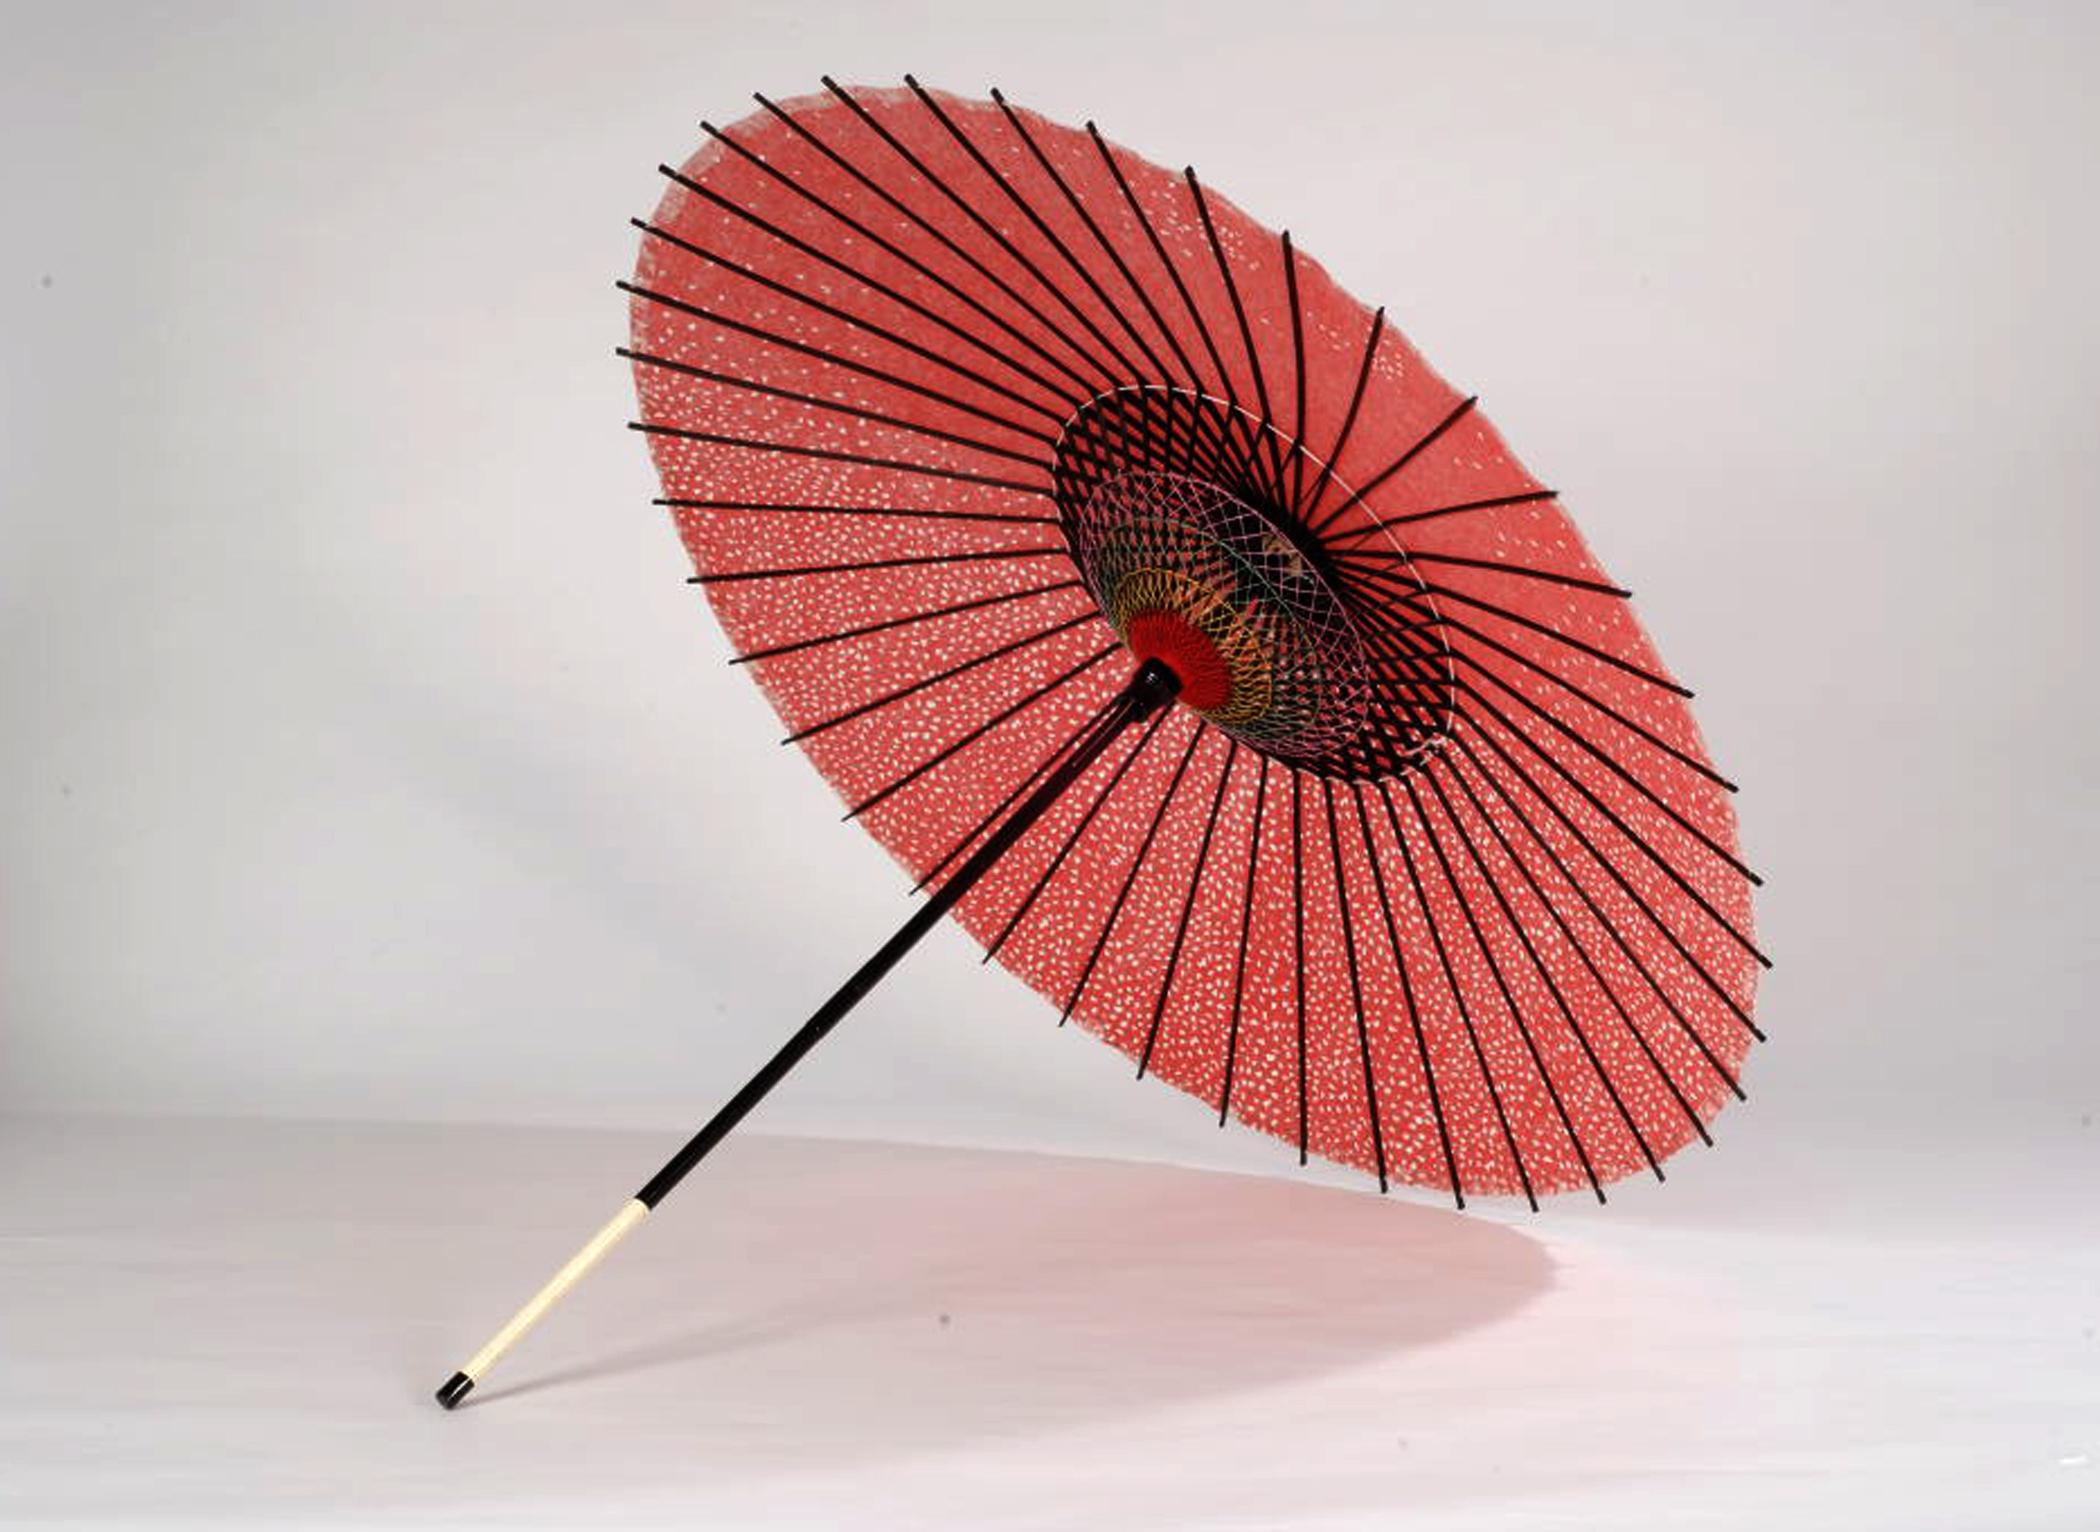 Japanese Parasol Dance - YouTube